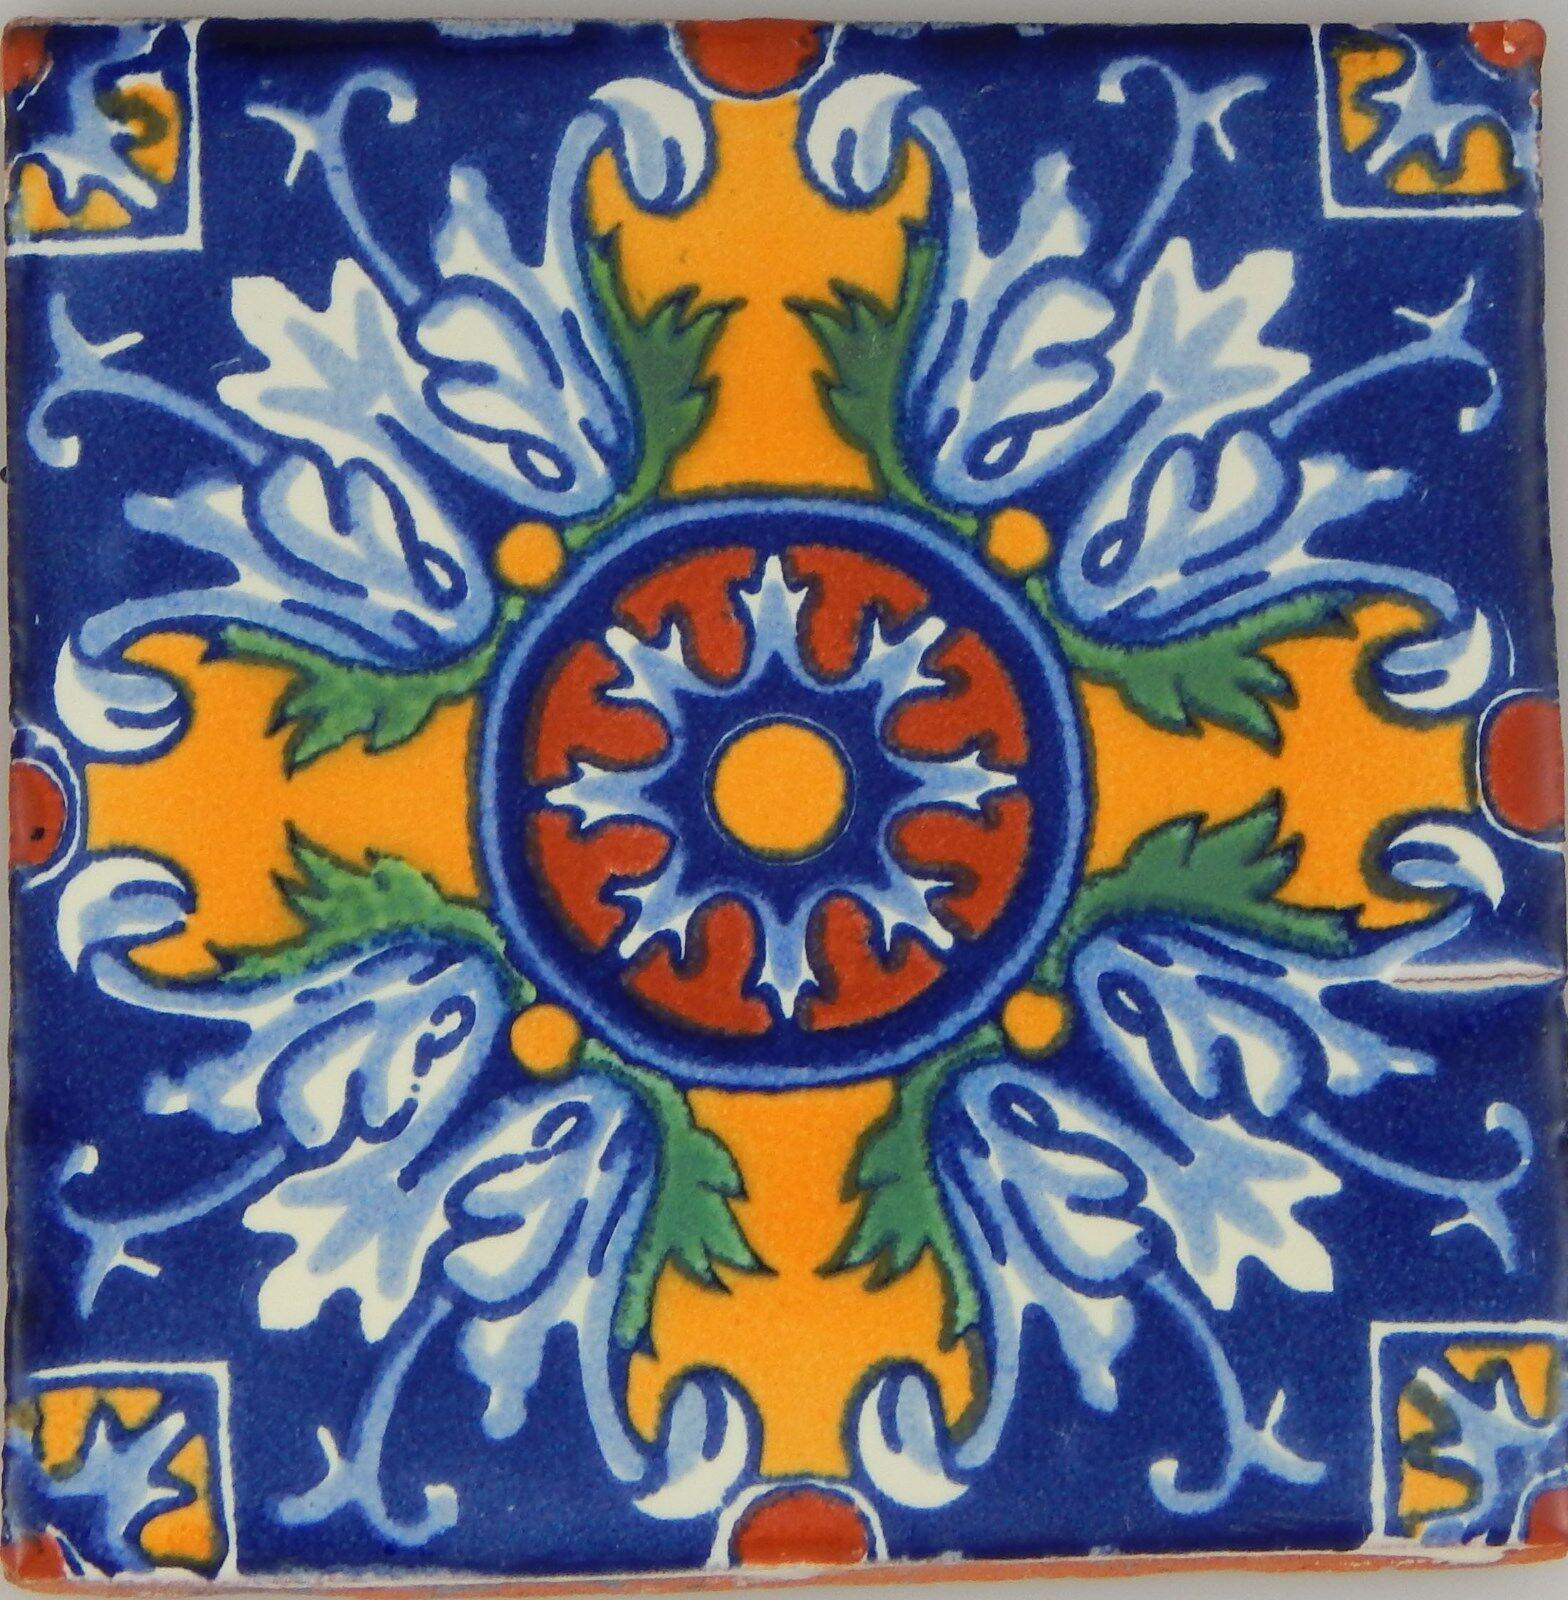 C290- Mexican Handmade Talavera Clay Tile Folk Art 4x4